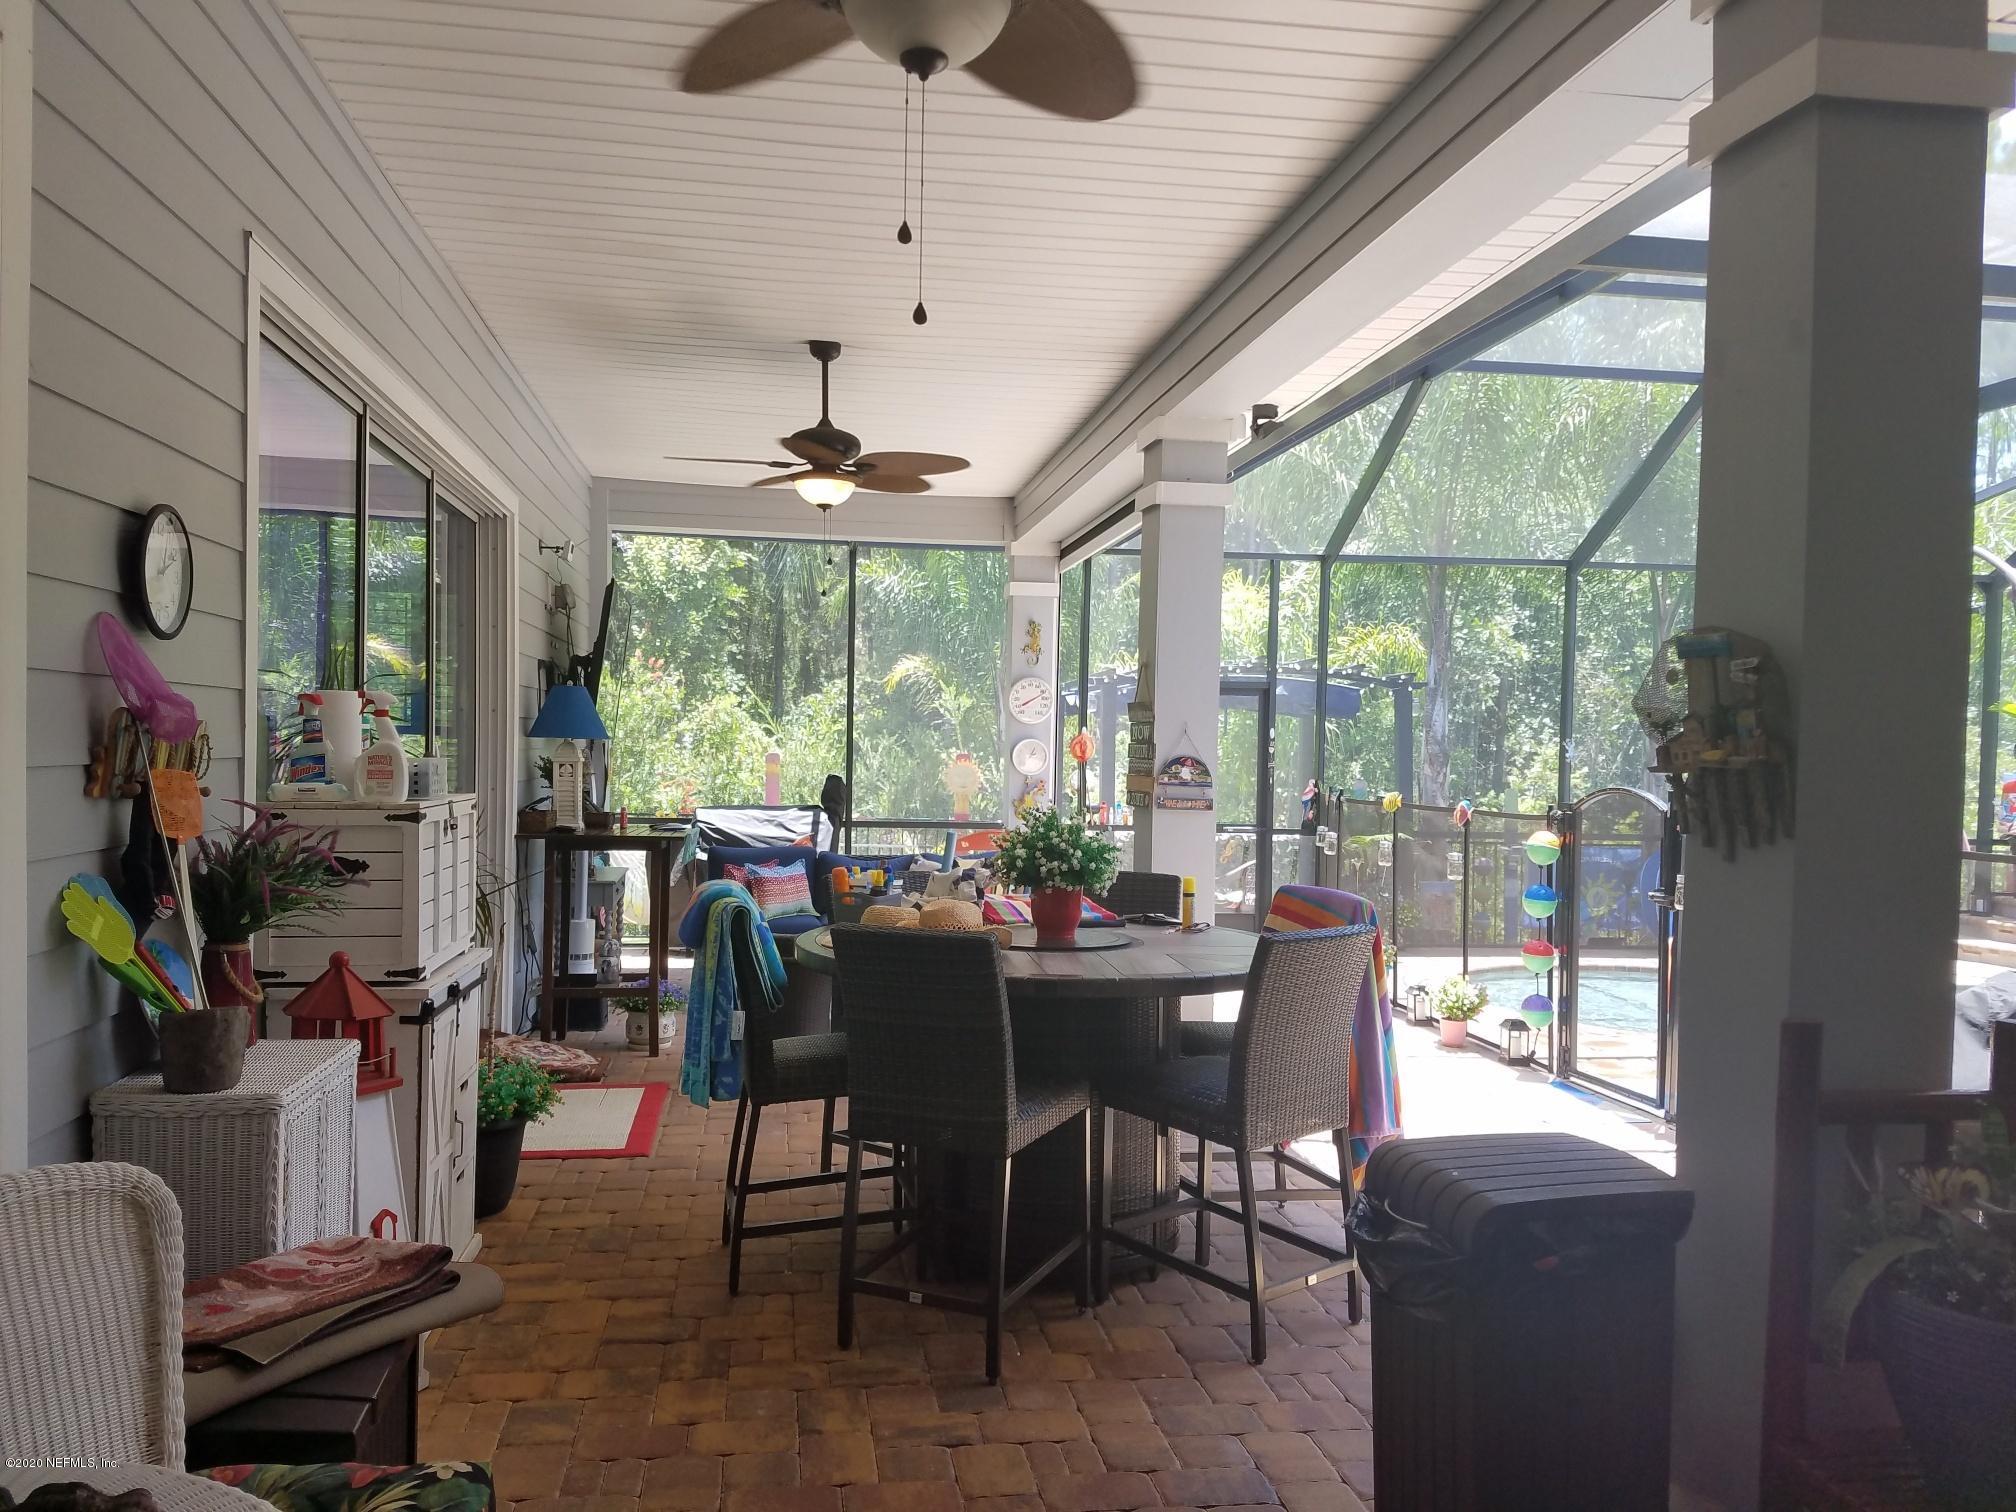 22 SALT CAY, ST AUGUSTINE, FLORIDA 32092, 4 Bedrooms Bedrooms, ,3 BathroomsBathrooms,Residential,For sale,SALT CAY,1048580